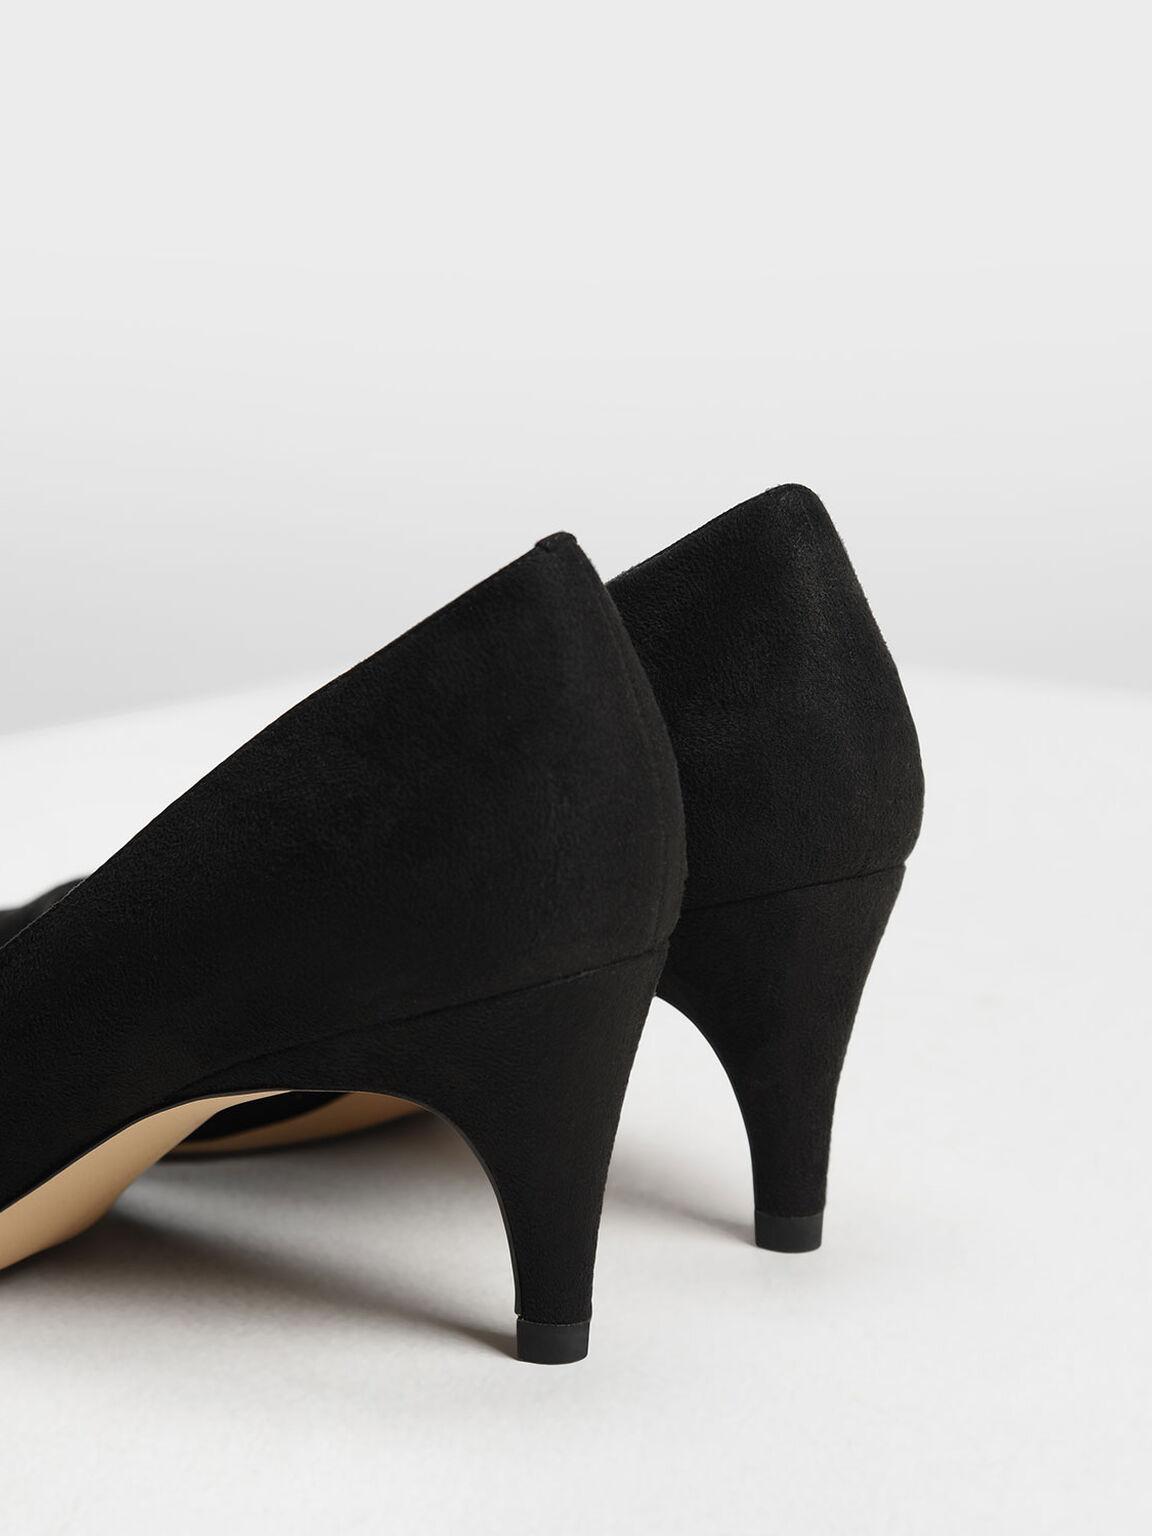 Classic Kitten Heel Pumps, Black, hi-res